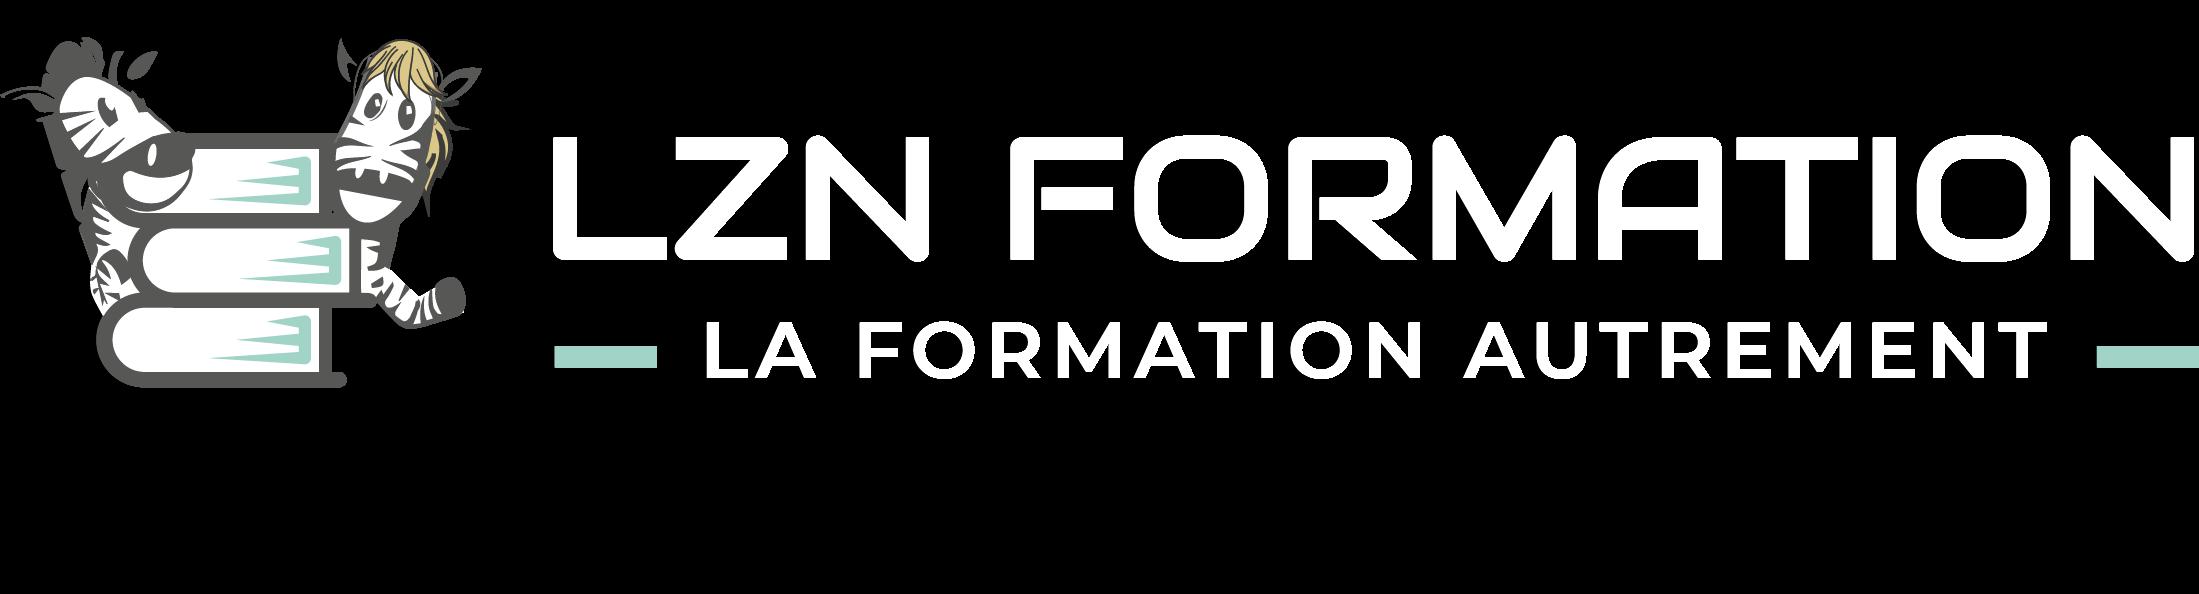 LZN FORMATION